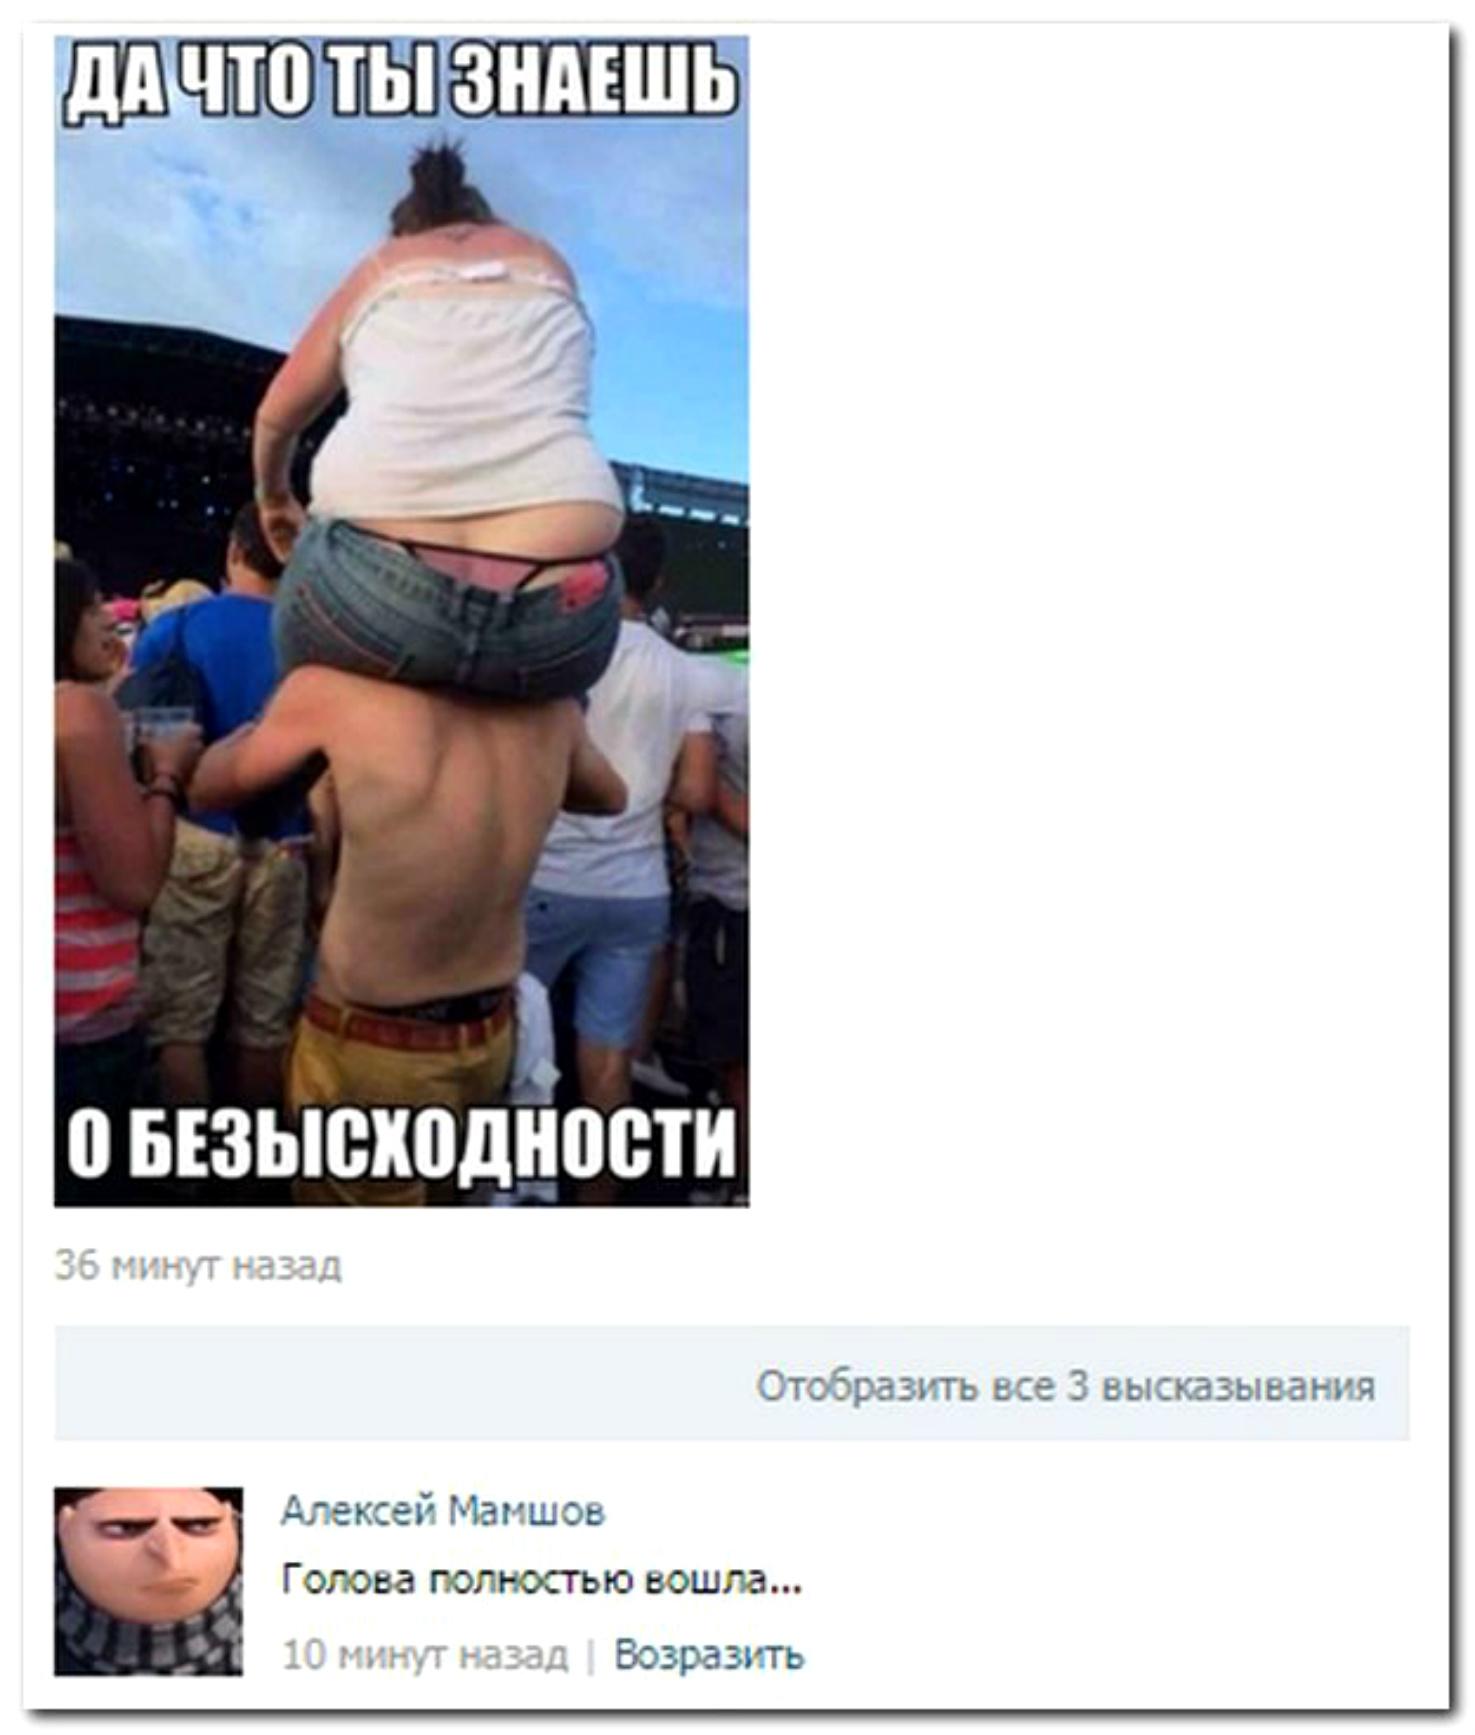 suchka-kommentariy-kommentirovat-kommentariev